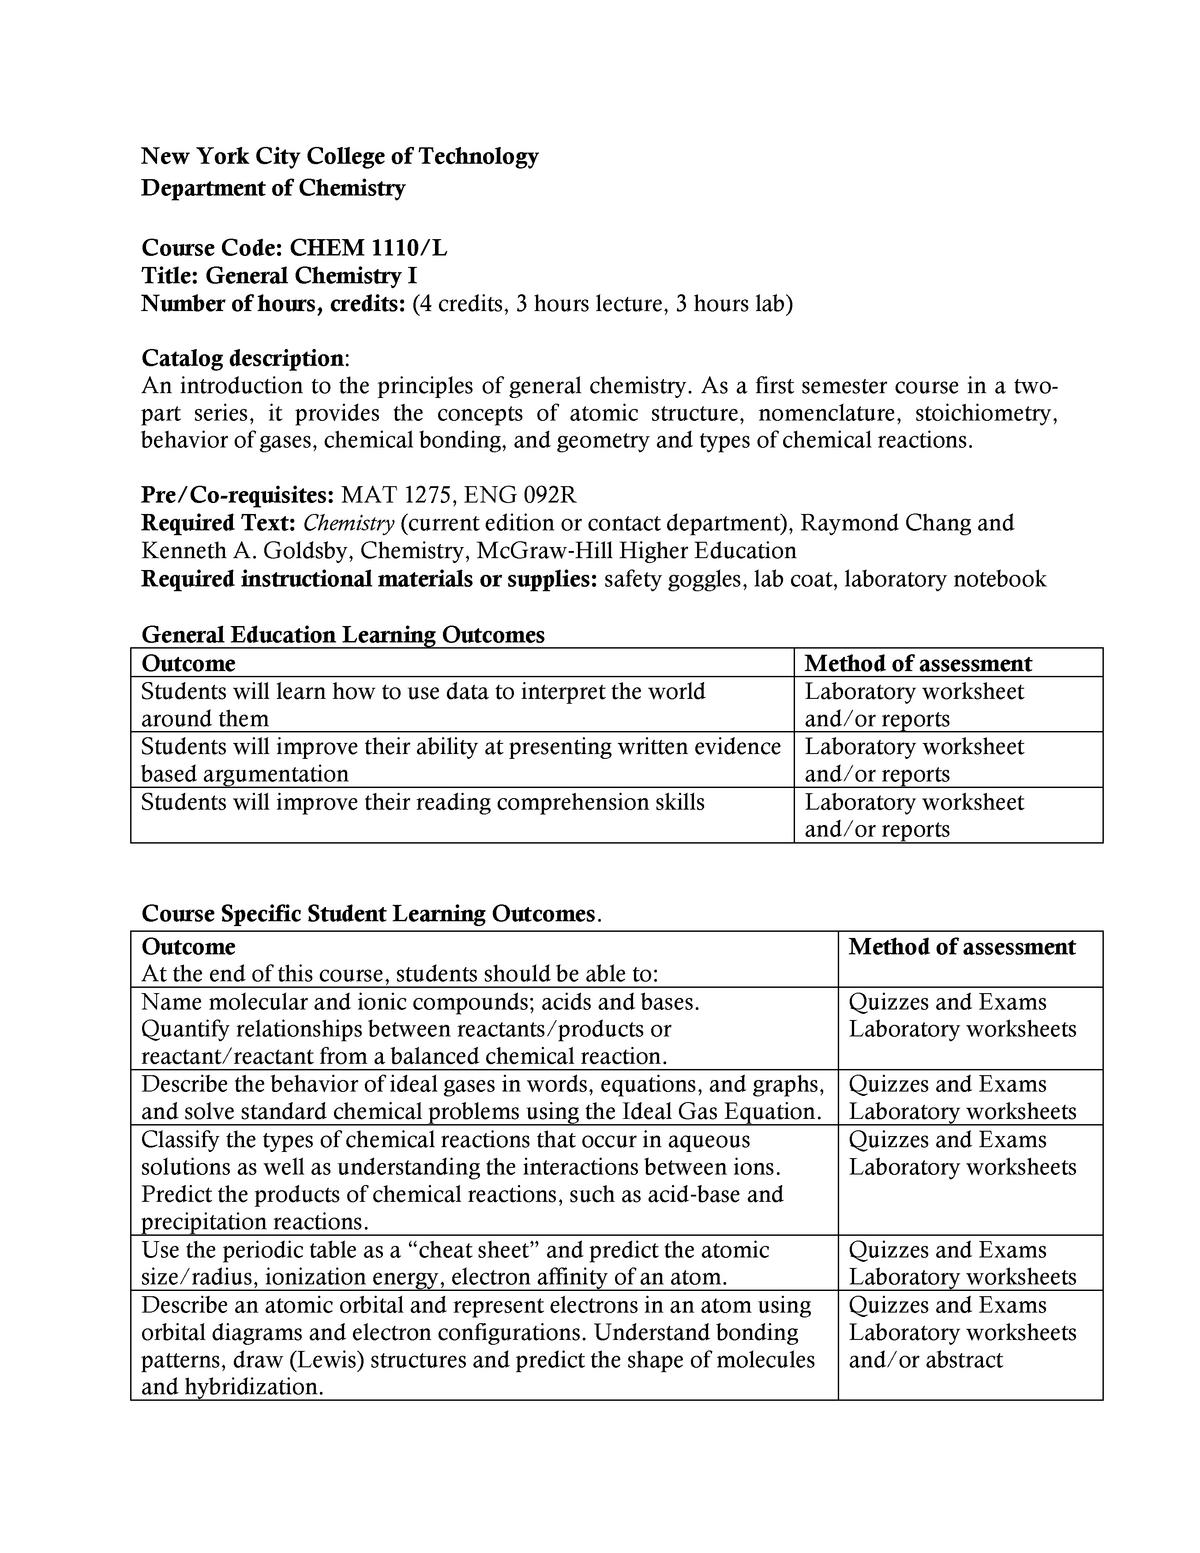 CHEM1110 - CHEM 1110 General Chemistry I - City Tech - StuDocu